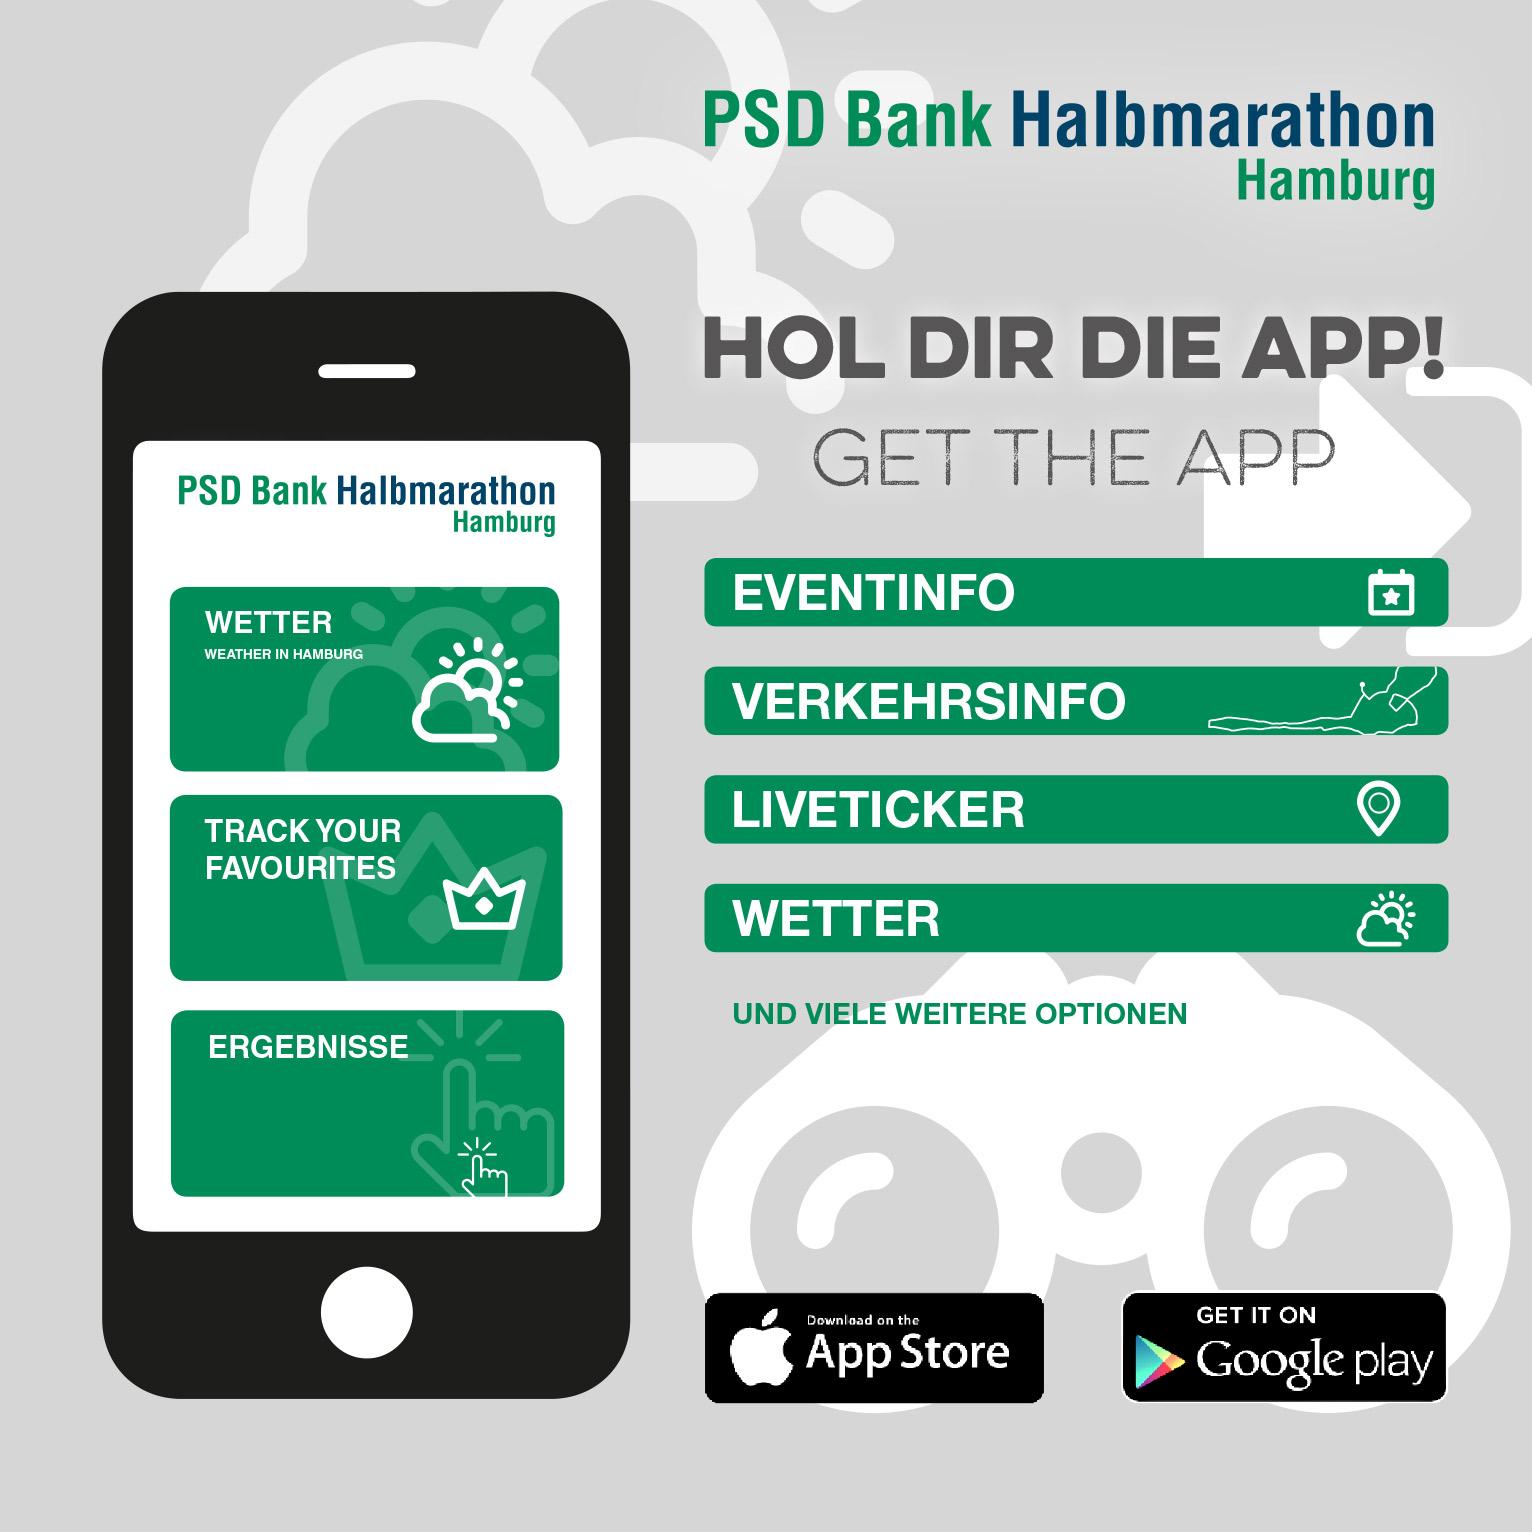 App - PSD Bank Halbmarathon Hamburg